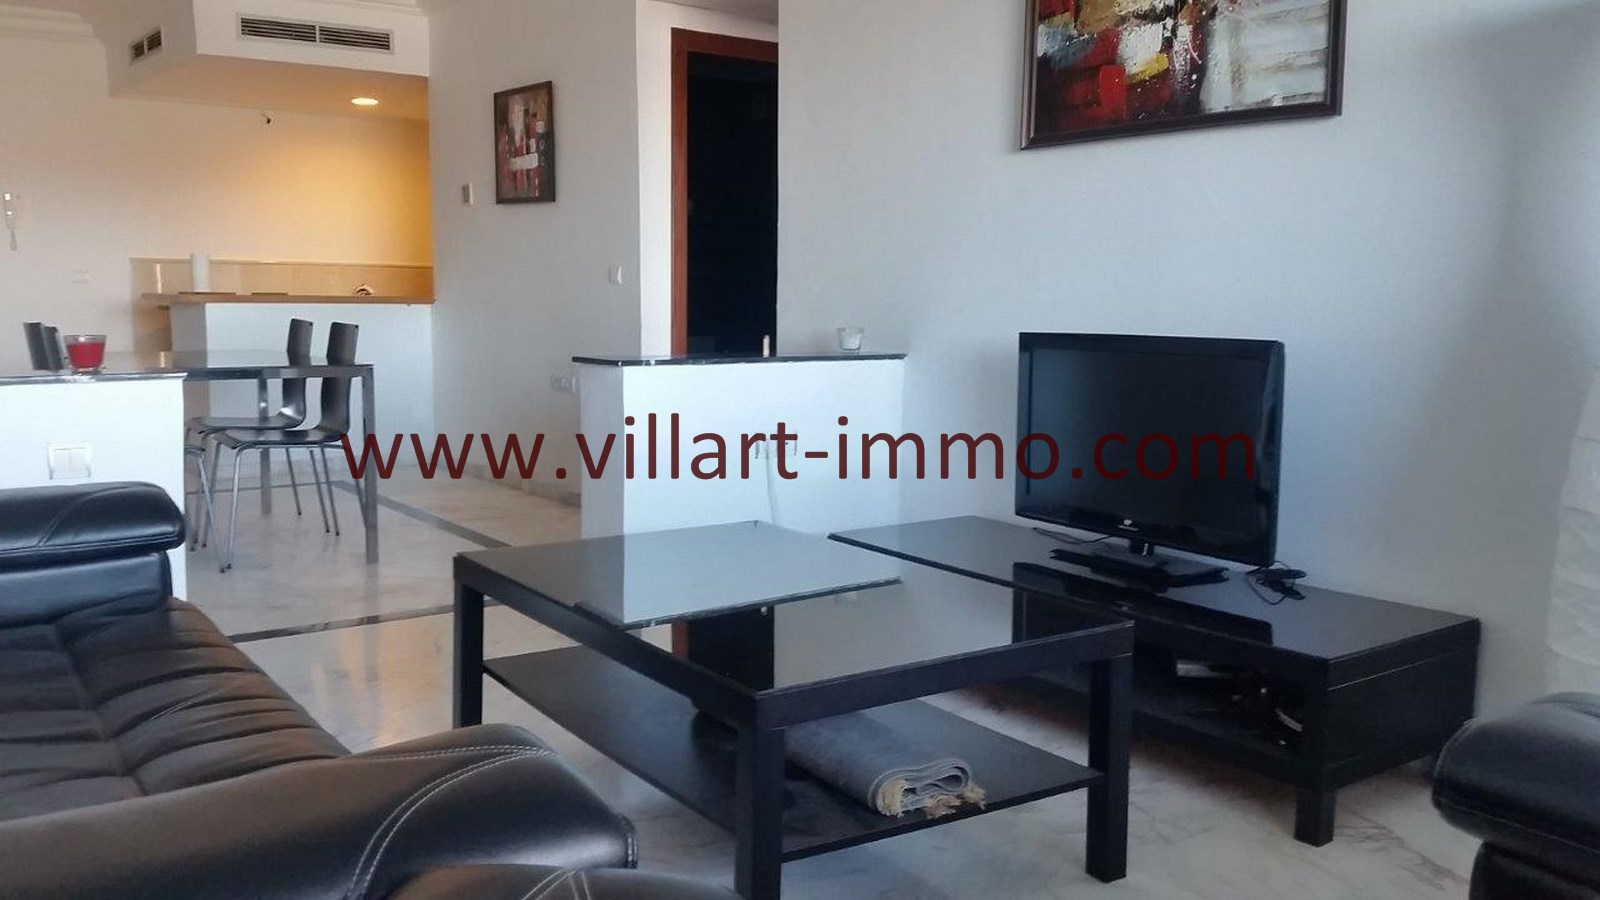 3-Vente-Appartement-Tanger-Centre-De-Ville-Salon 3-VA576-Villart Immo